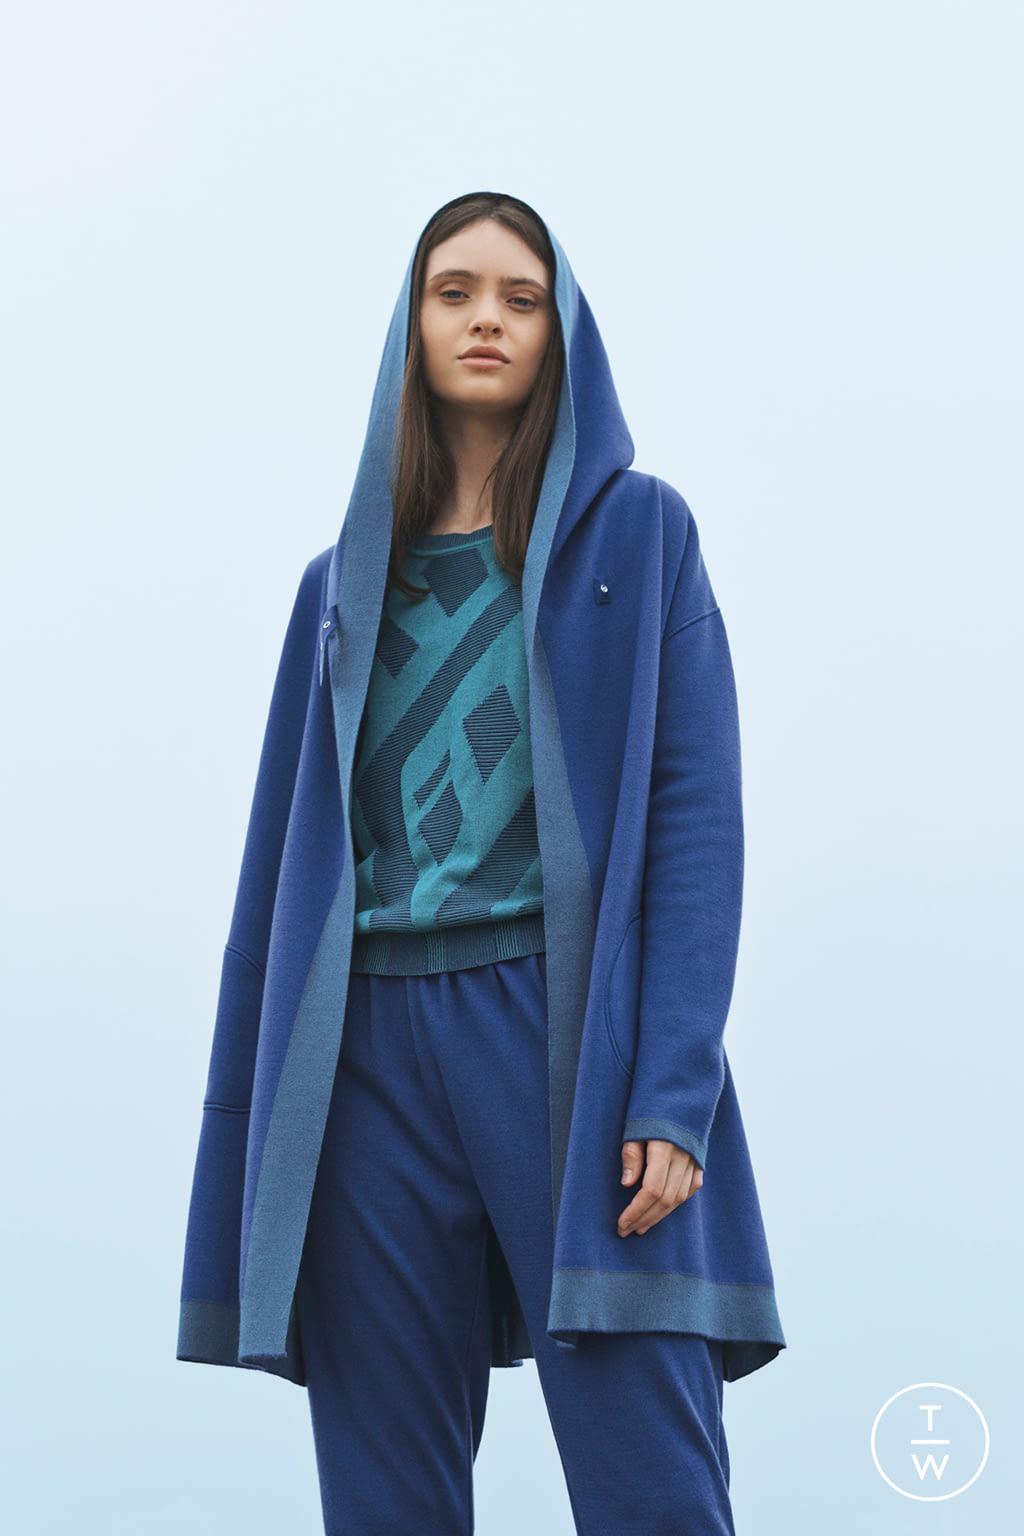 Fashion Week Paris Spring/Summer 2019 look 15 de la collection Maison Ullens womenswear